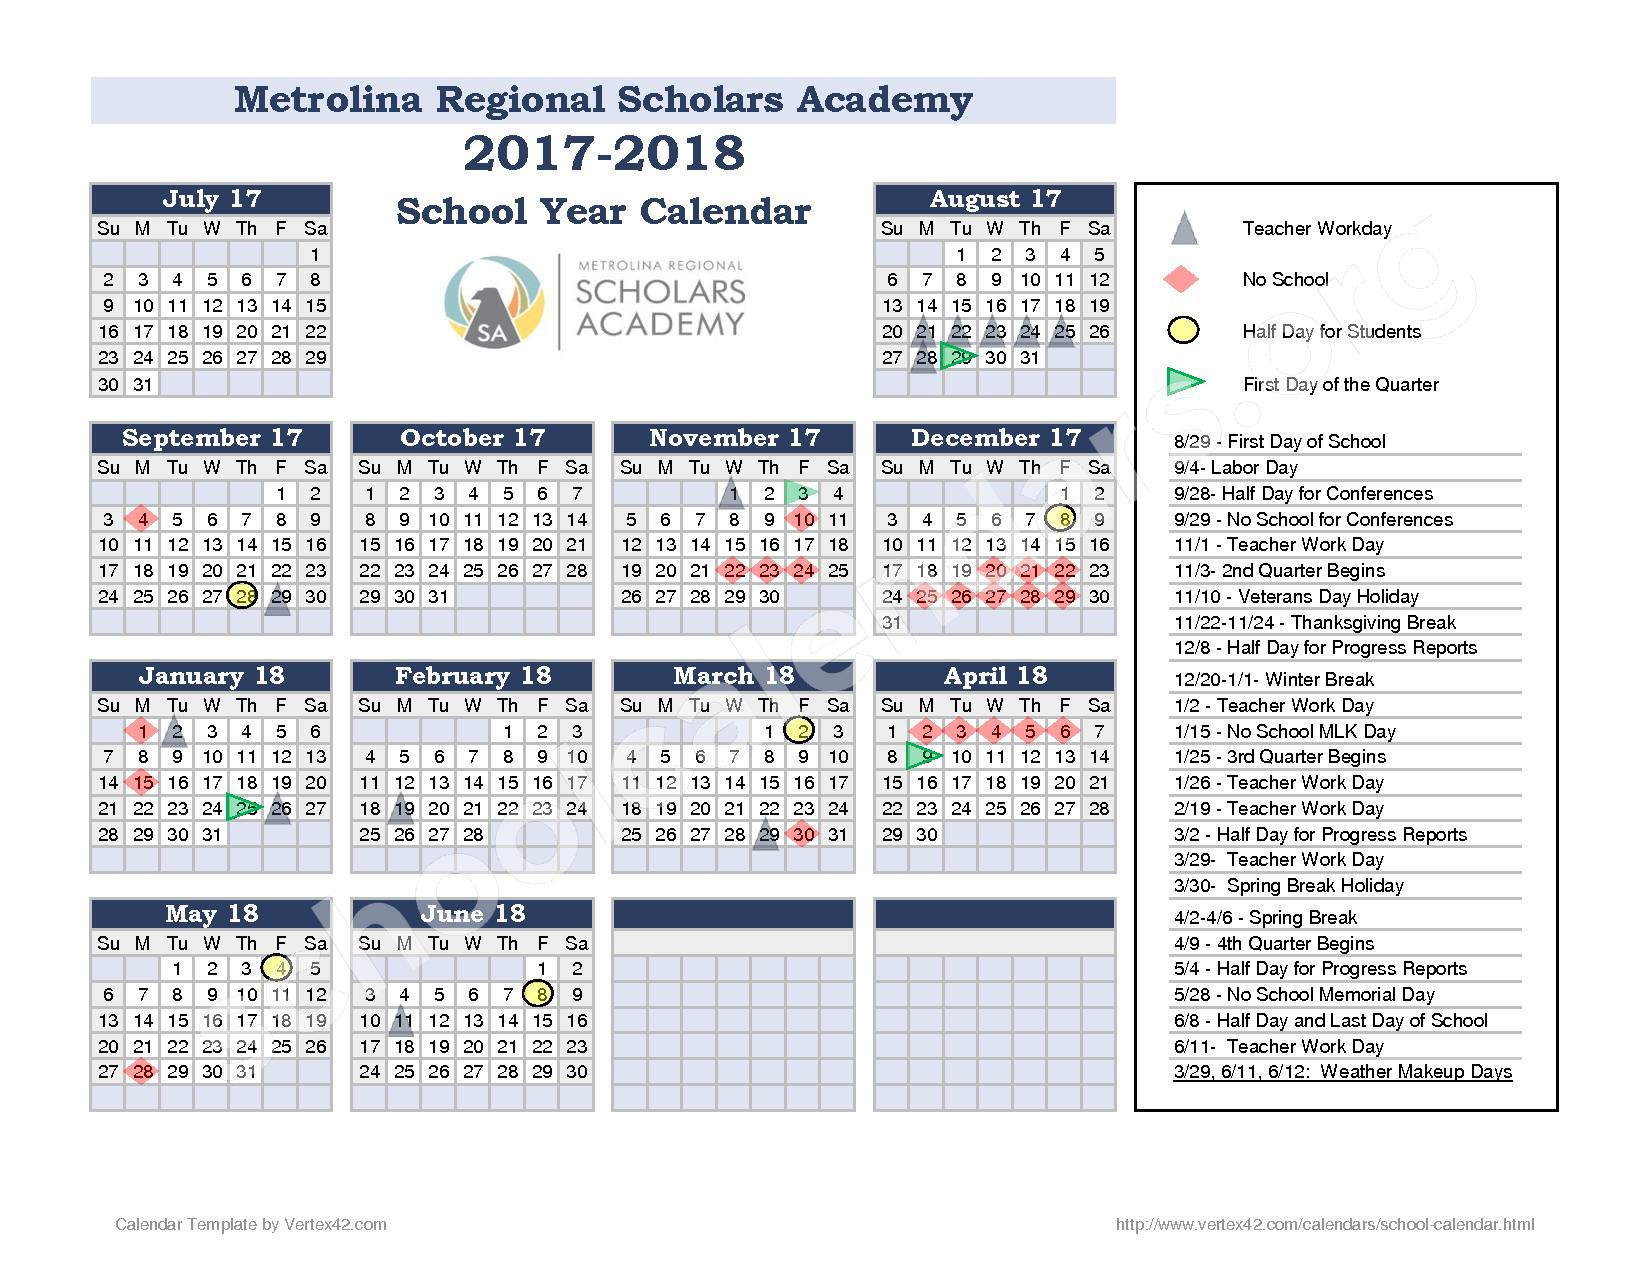 2017 - 2018 school calendar – Metrolina Regional Scholars Academy – page 1